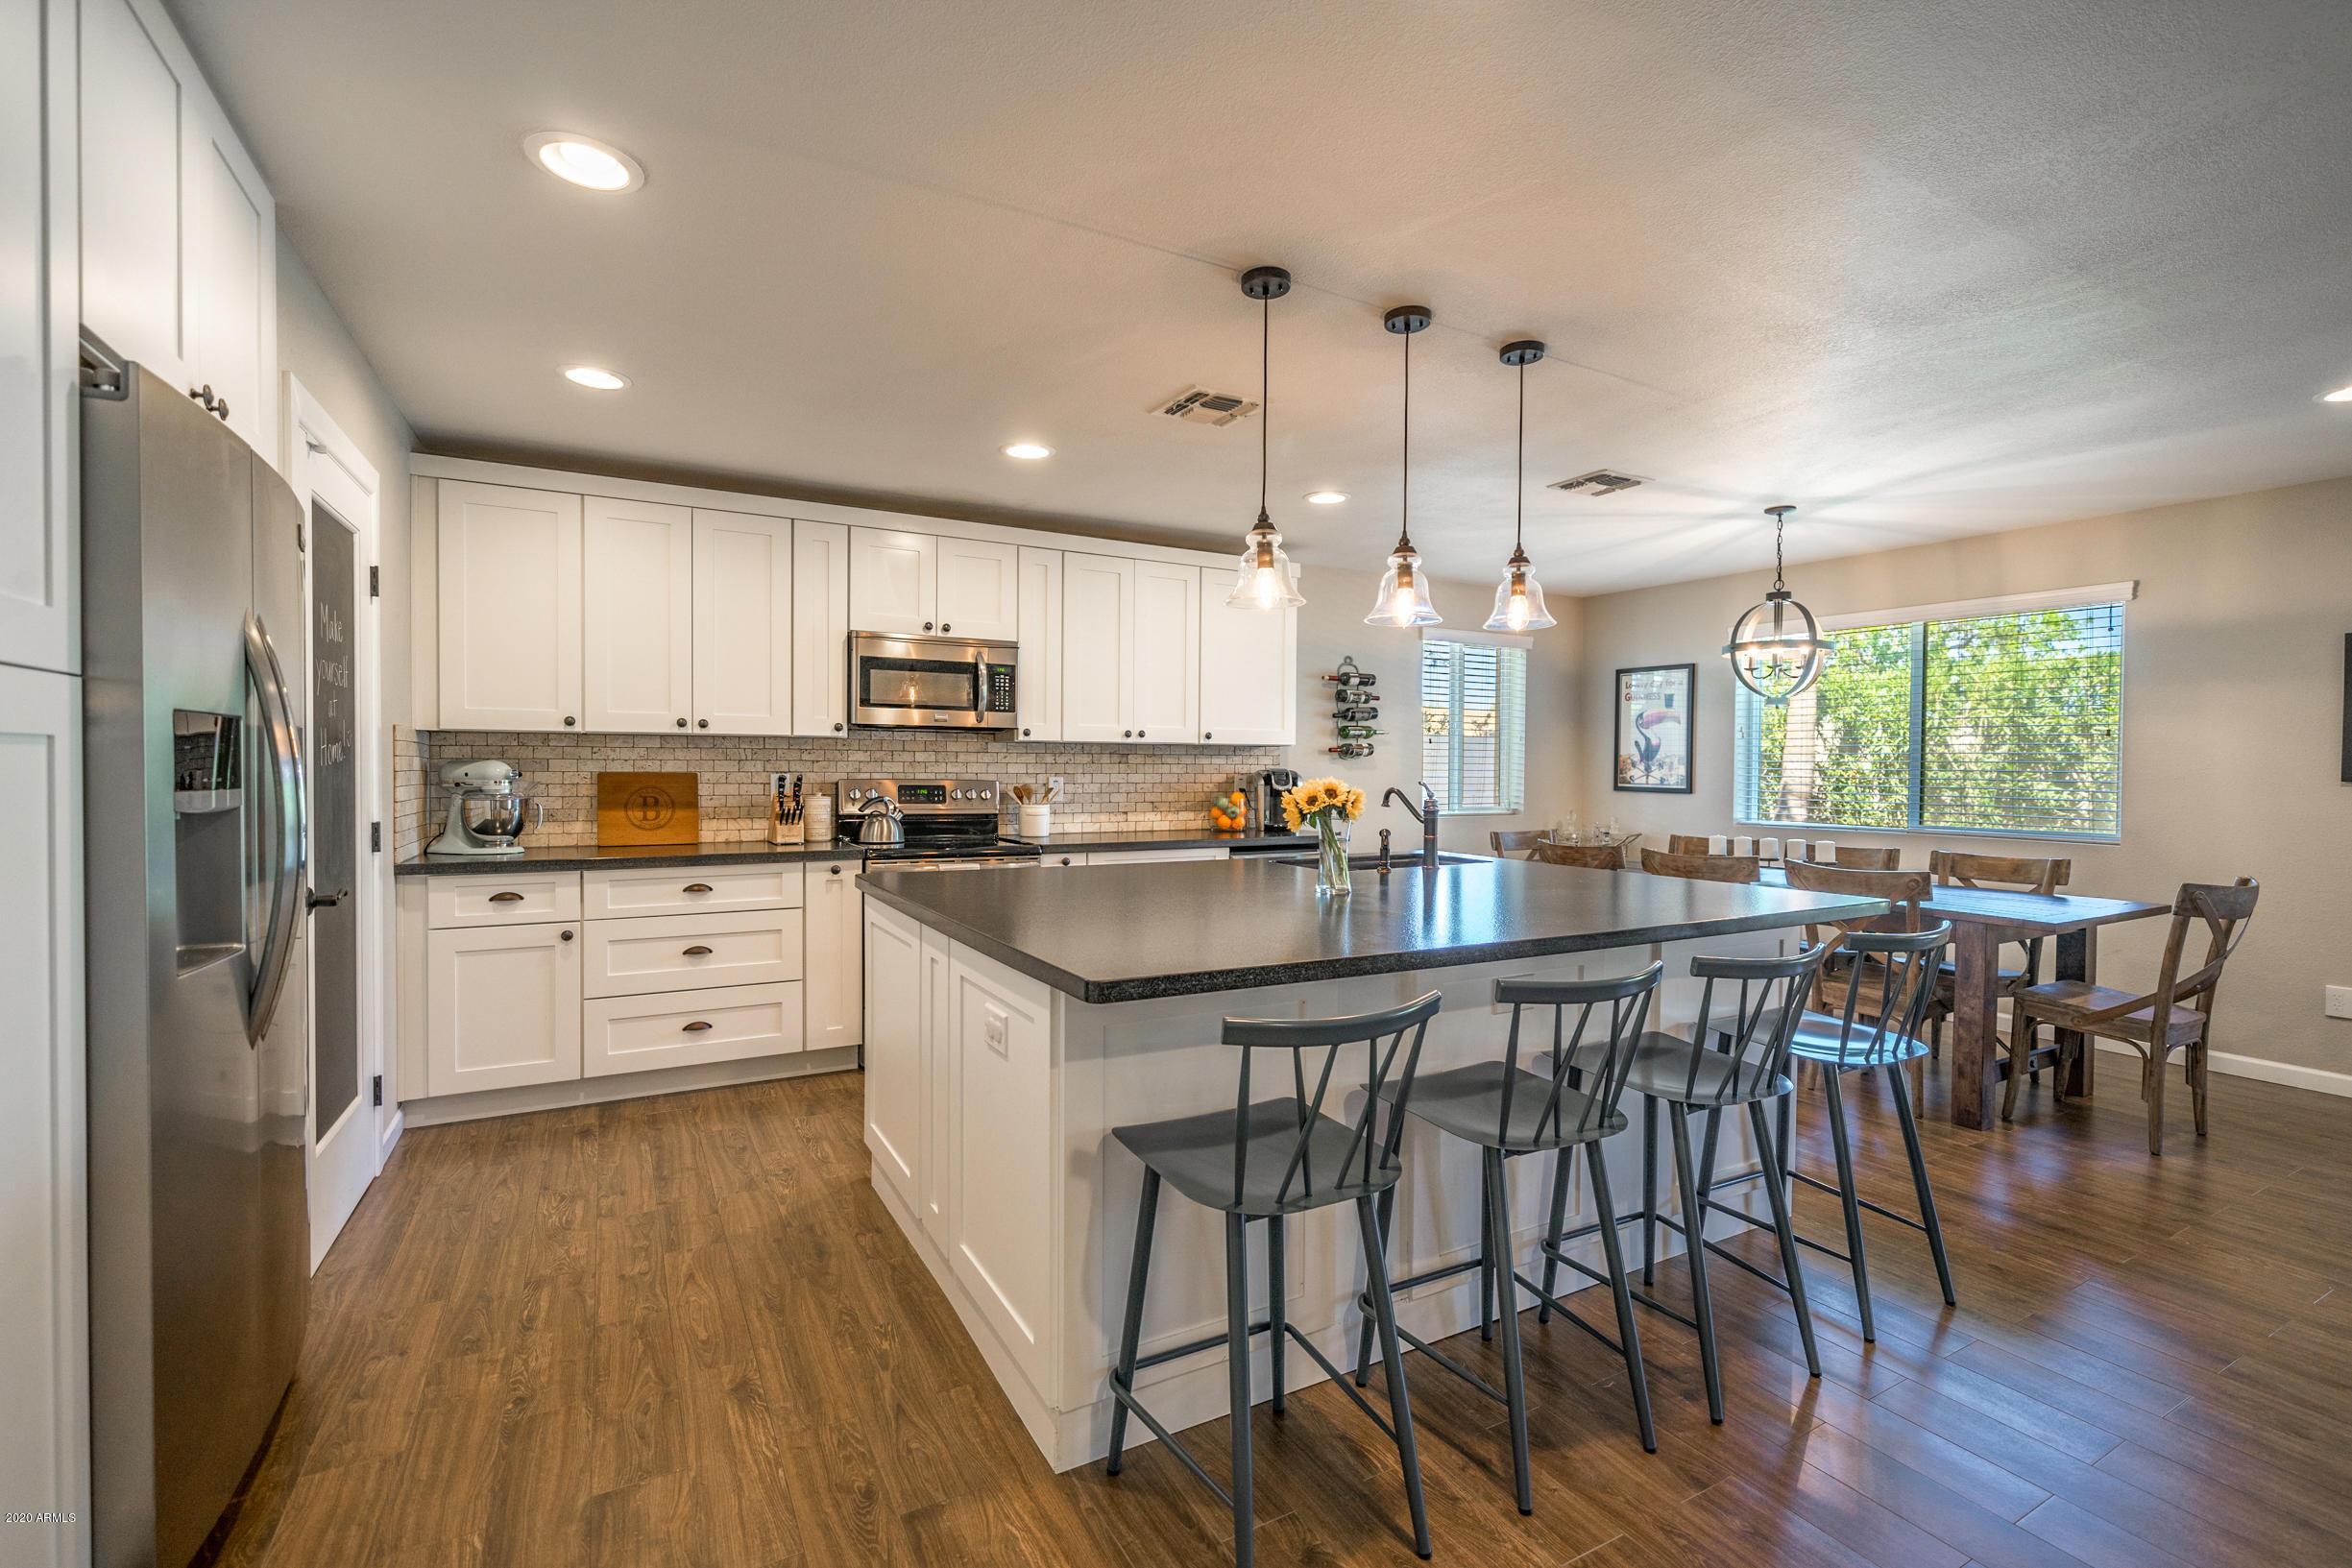 6102 HEARN Road, Scottsdale, Arizona 85254, 3 Bedrooms Bedrooms, ,2 BathroomsBathrooms,Residential,For Sale,HEARN,6137853